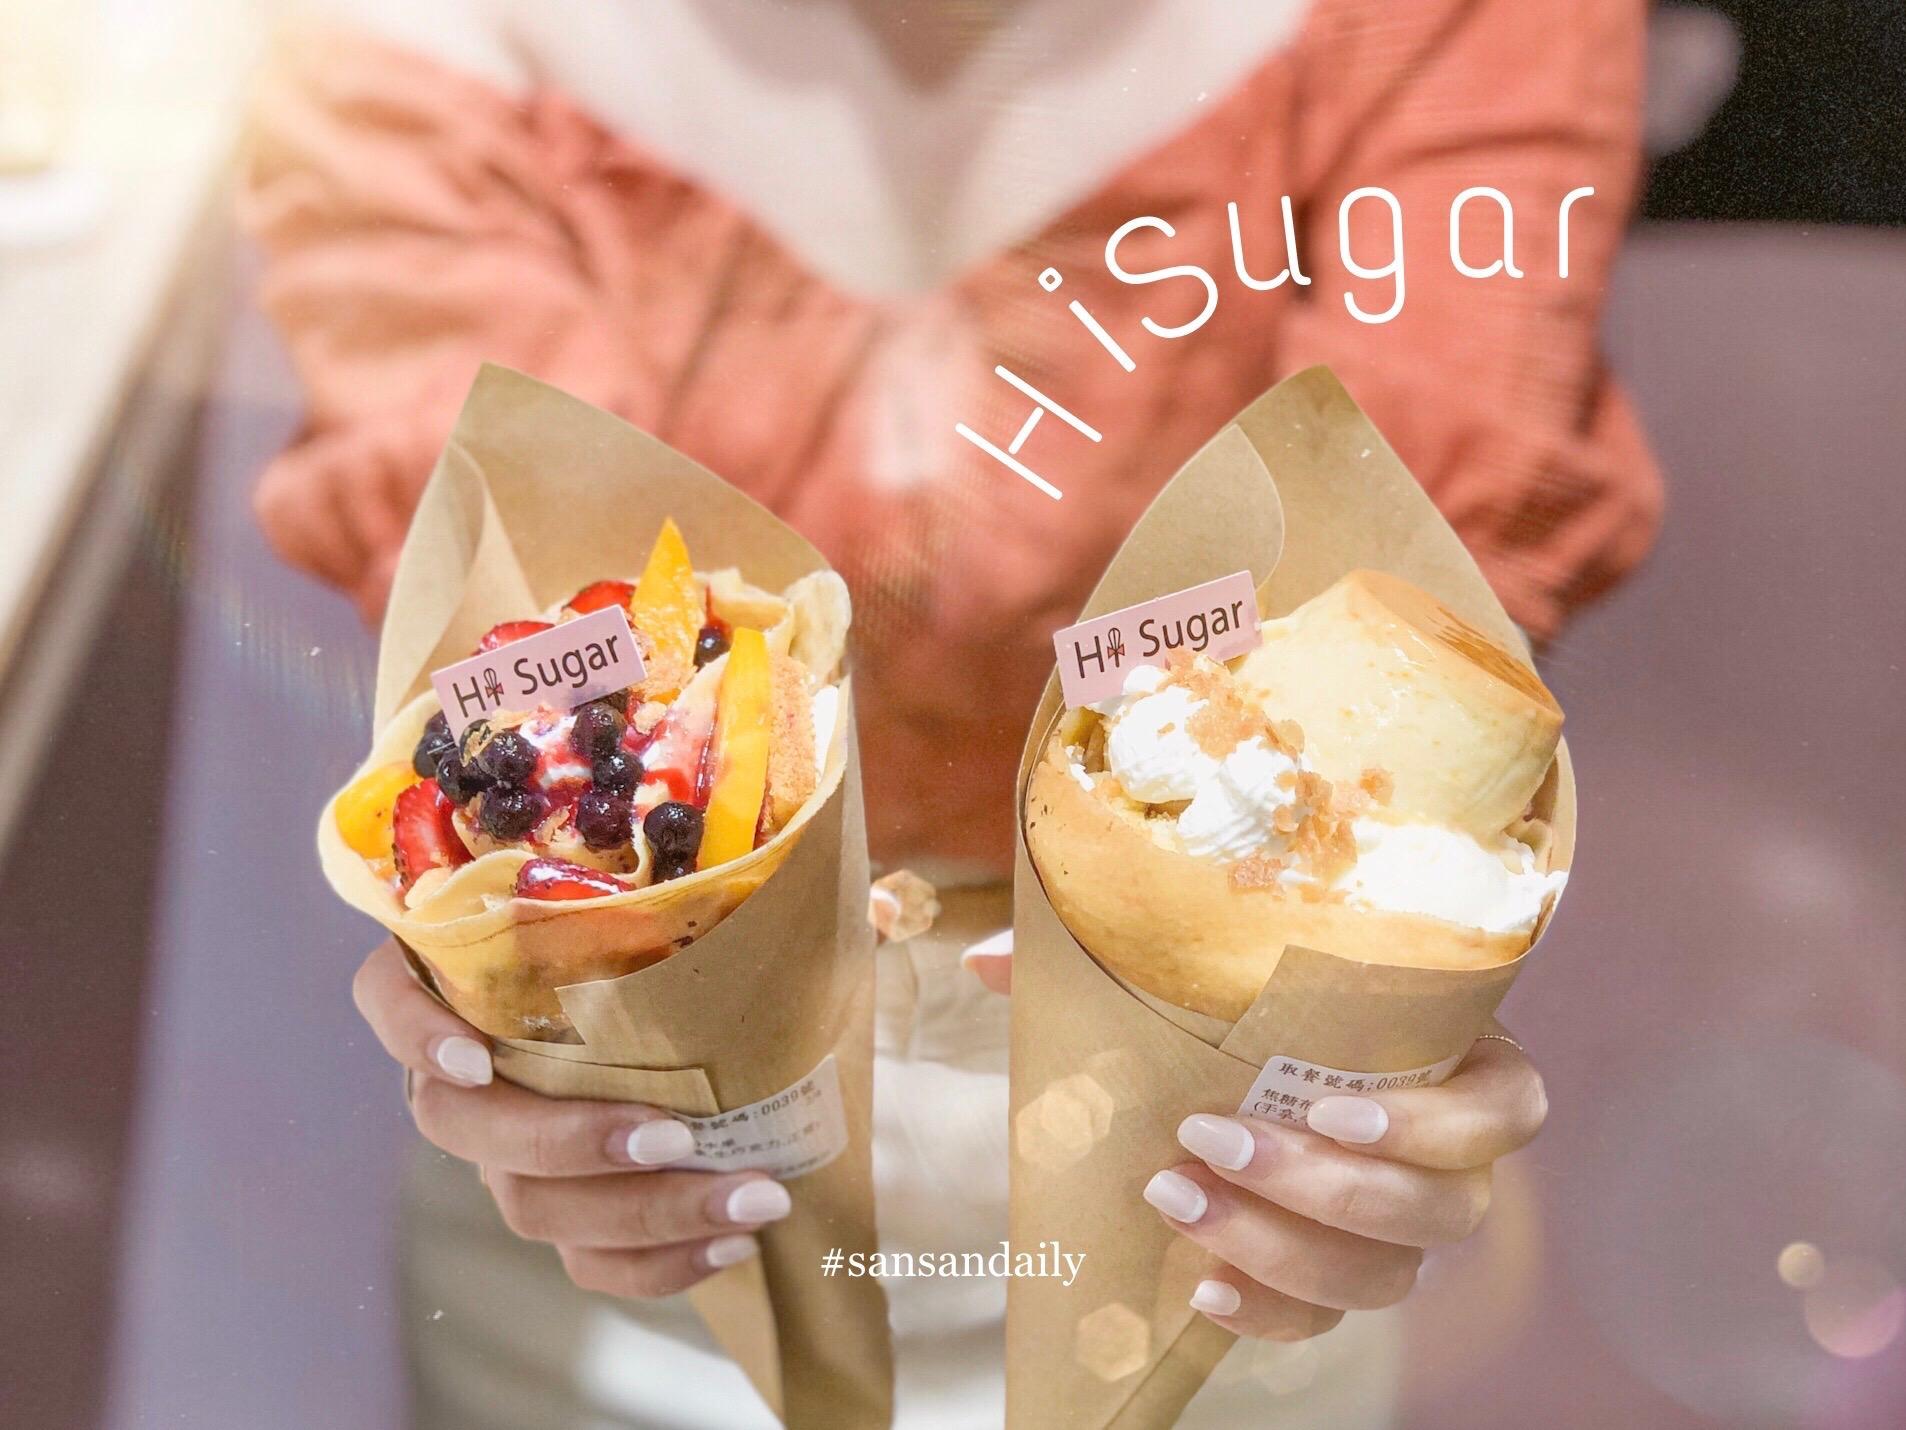 KPOP追星必朝聖甜點店!台北迷妹打卡點 中山區甜點推薦 嗨糖HiSugar|sansan吃台北